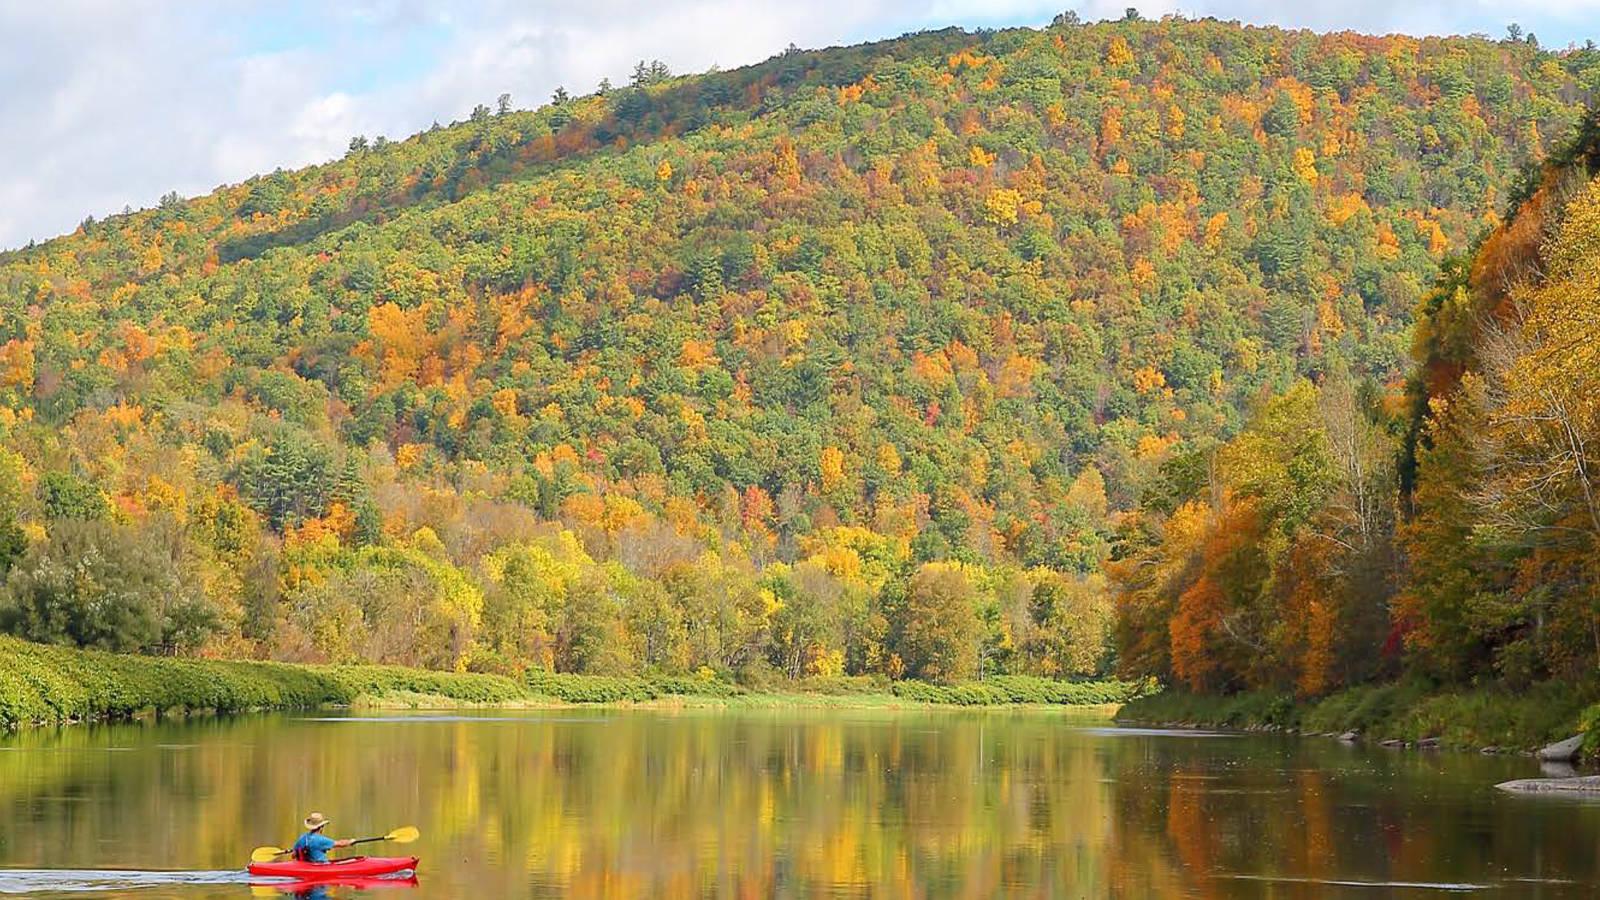 Residents and visitors alike enjoy recreational boating along the Upper Delaware River amidst scenic backdrops like Kilgour Spur.